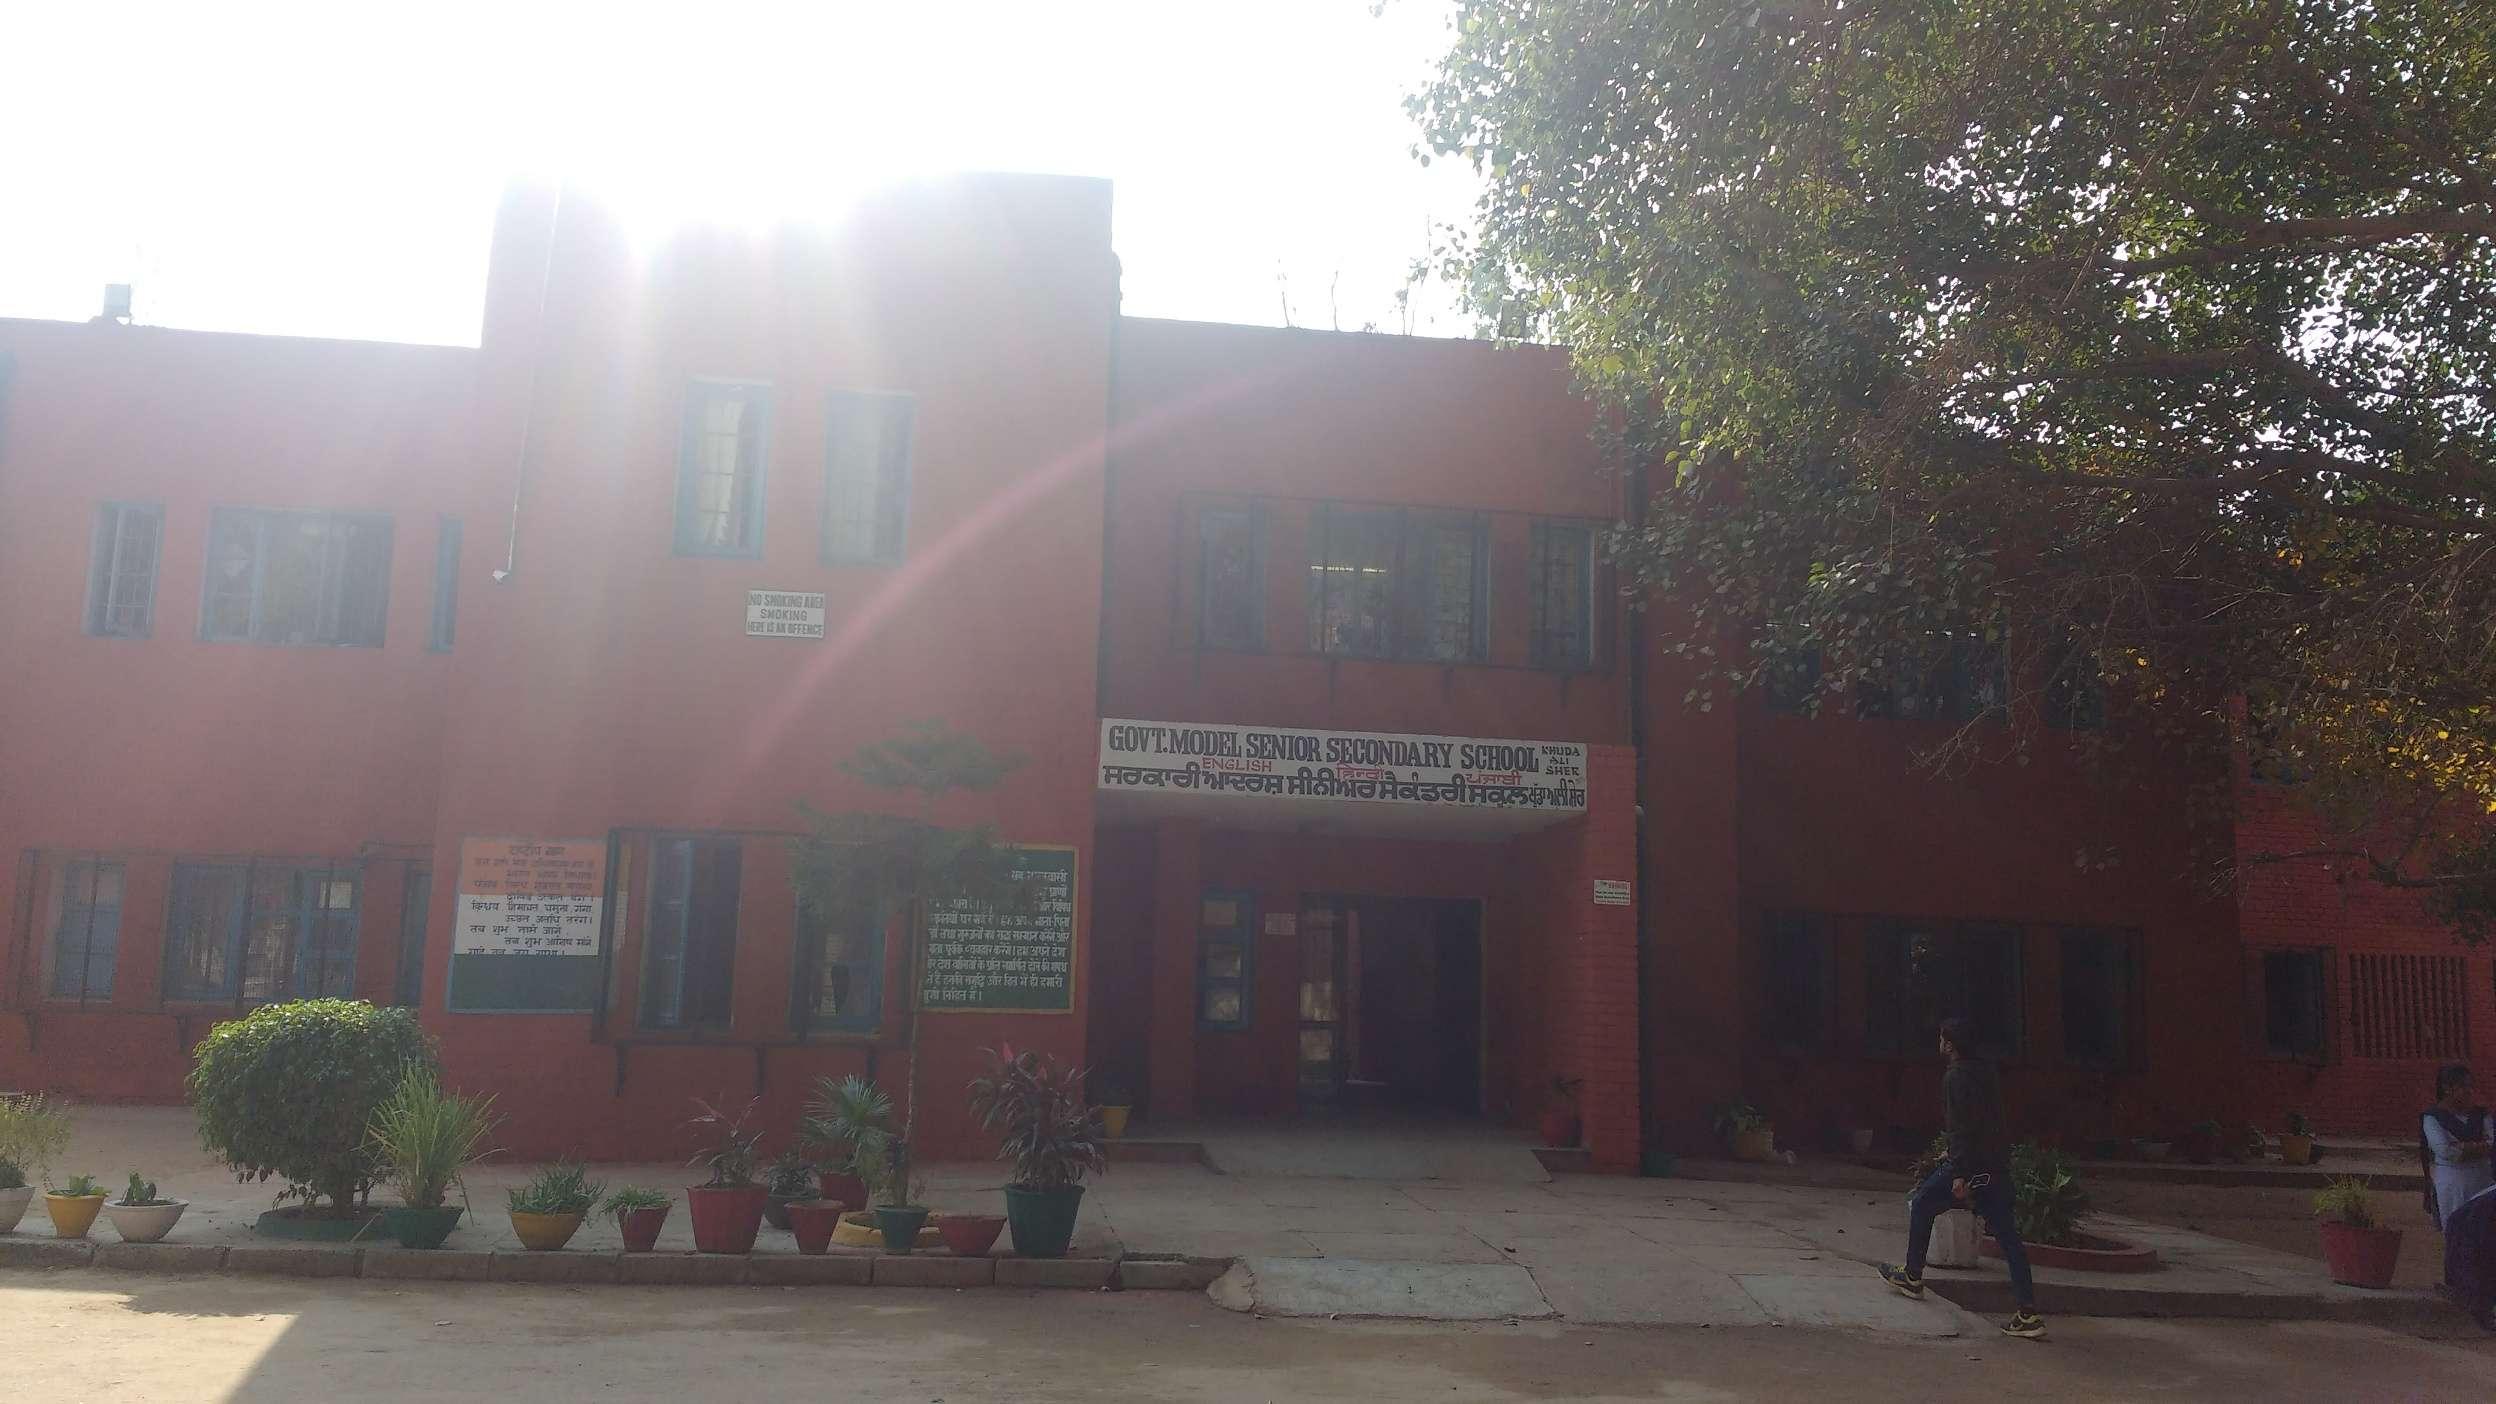 GOVT HIGH SCHOOL VILL KHUDA ALISHER P O NADA CHANDIGARH 2620039